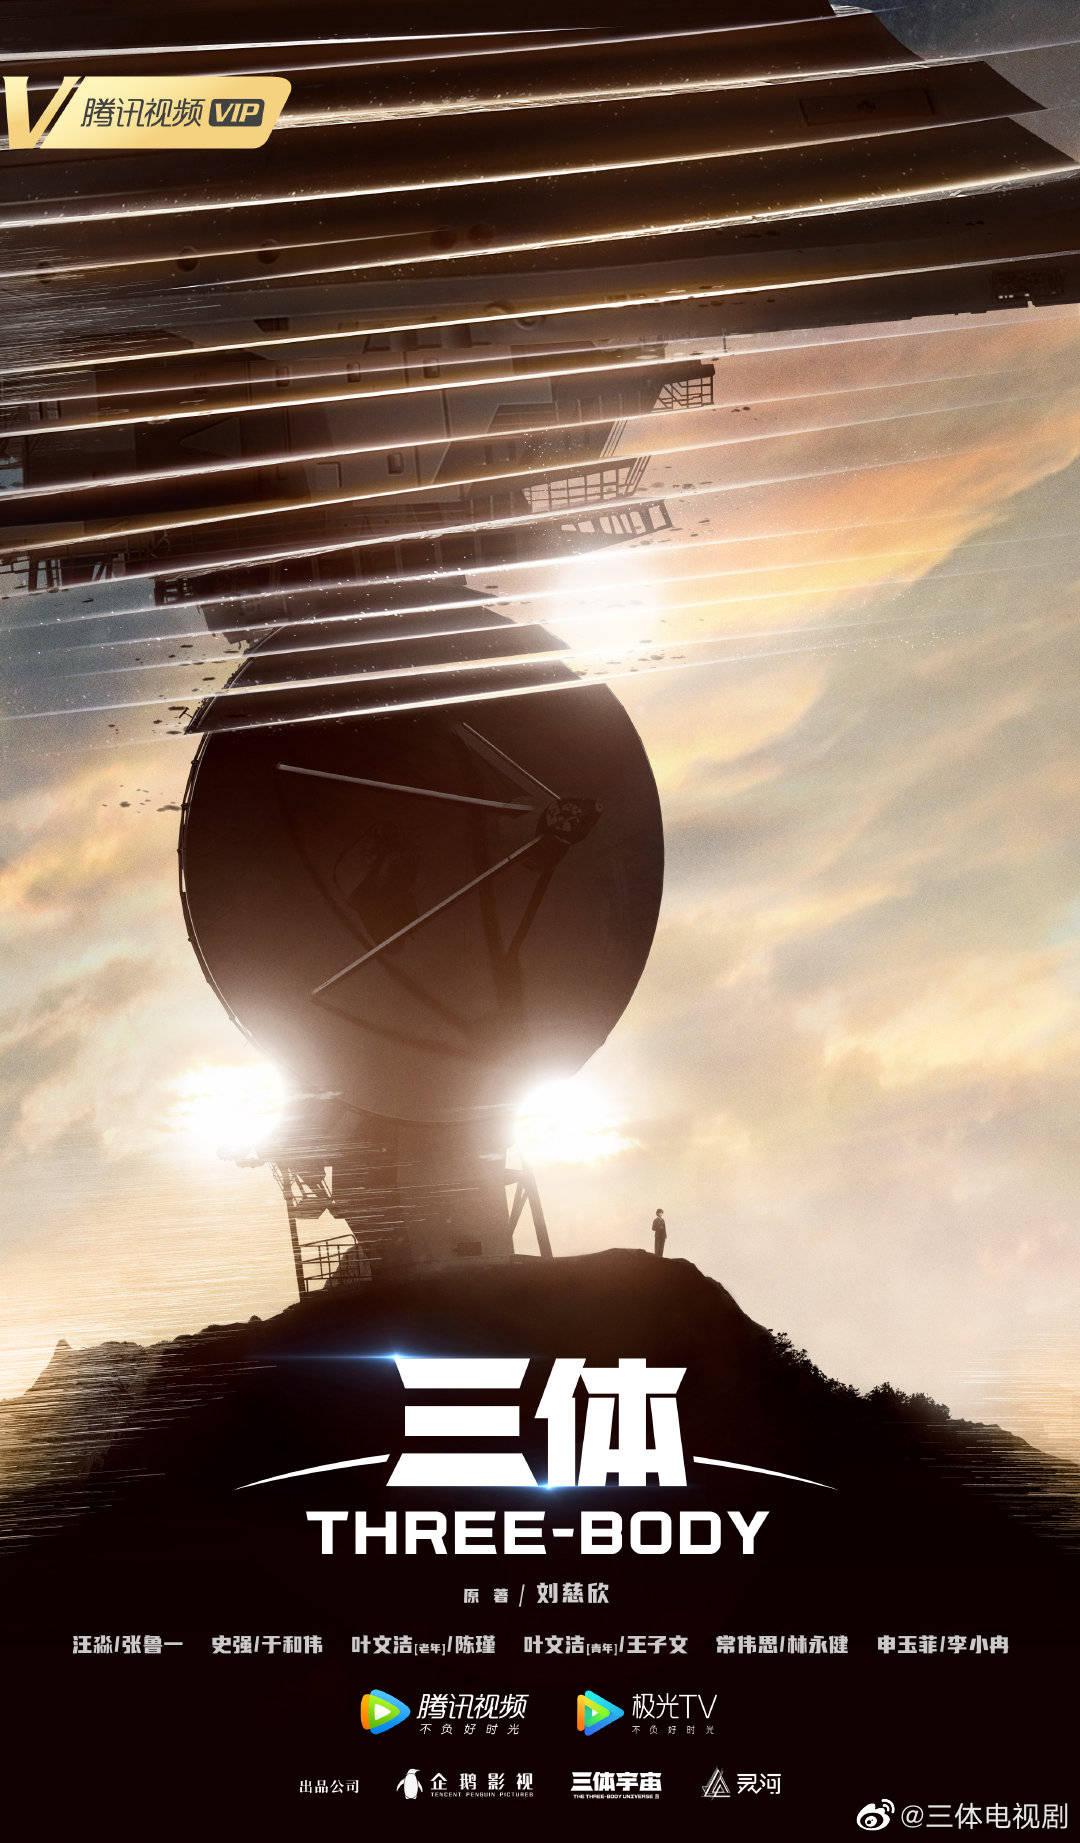 cctv6电影频道节目表电视剧《三体》官宣